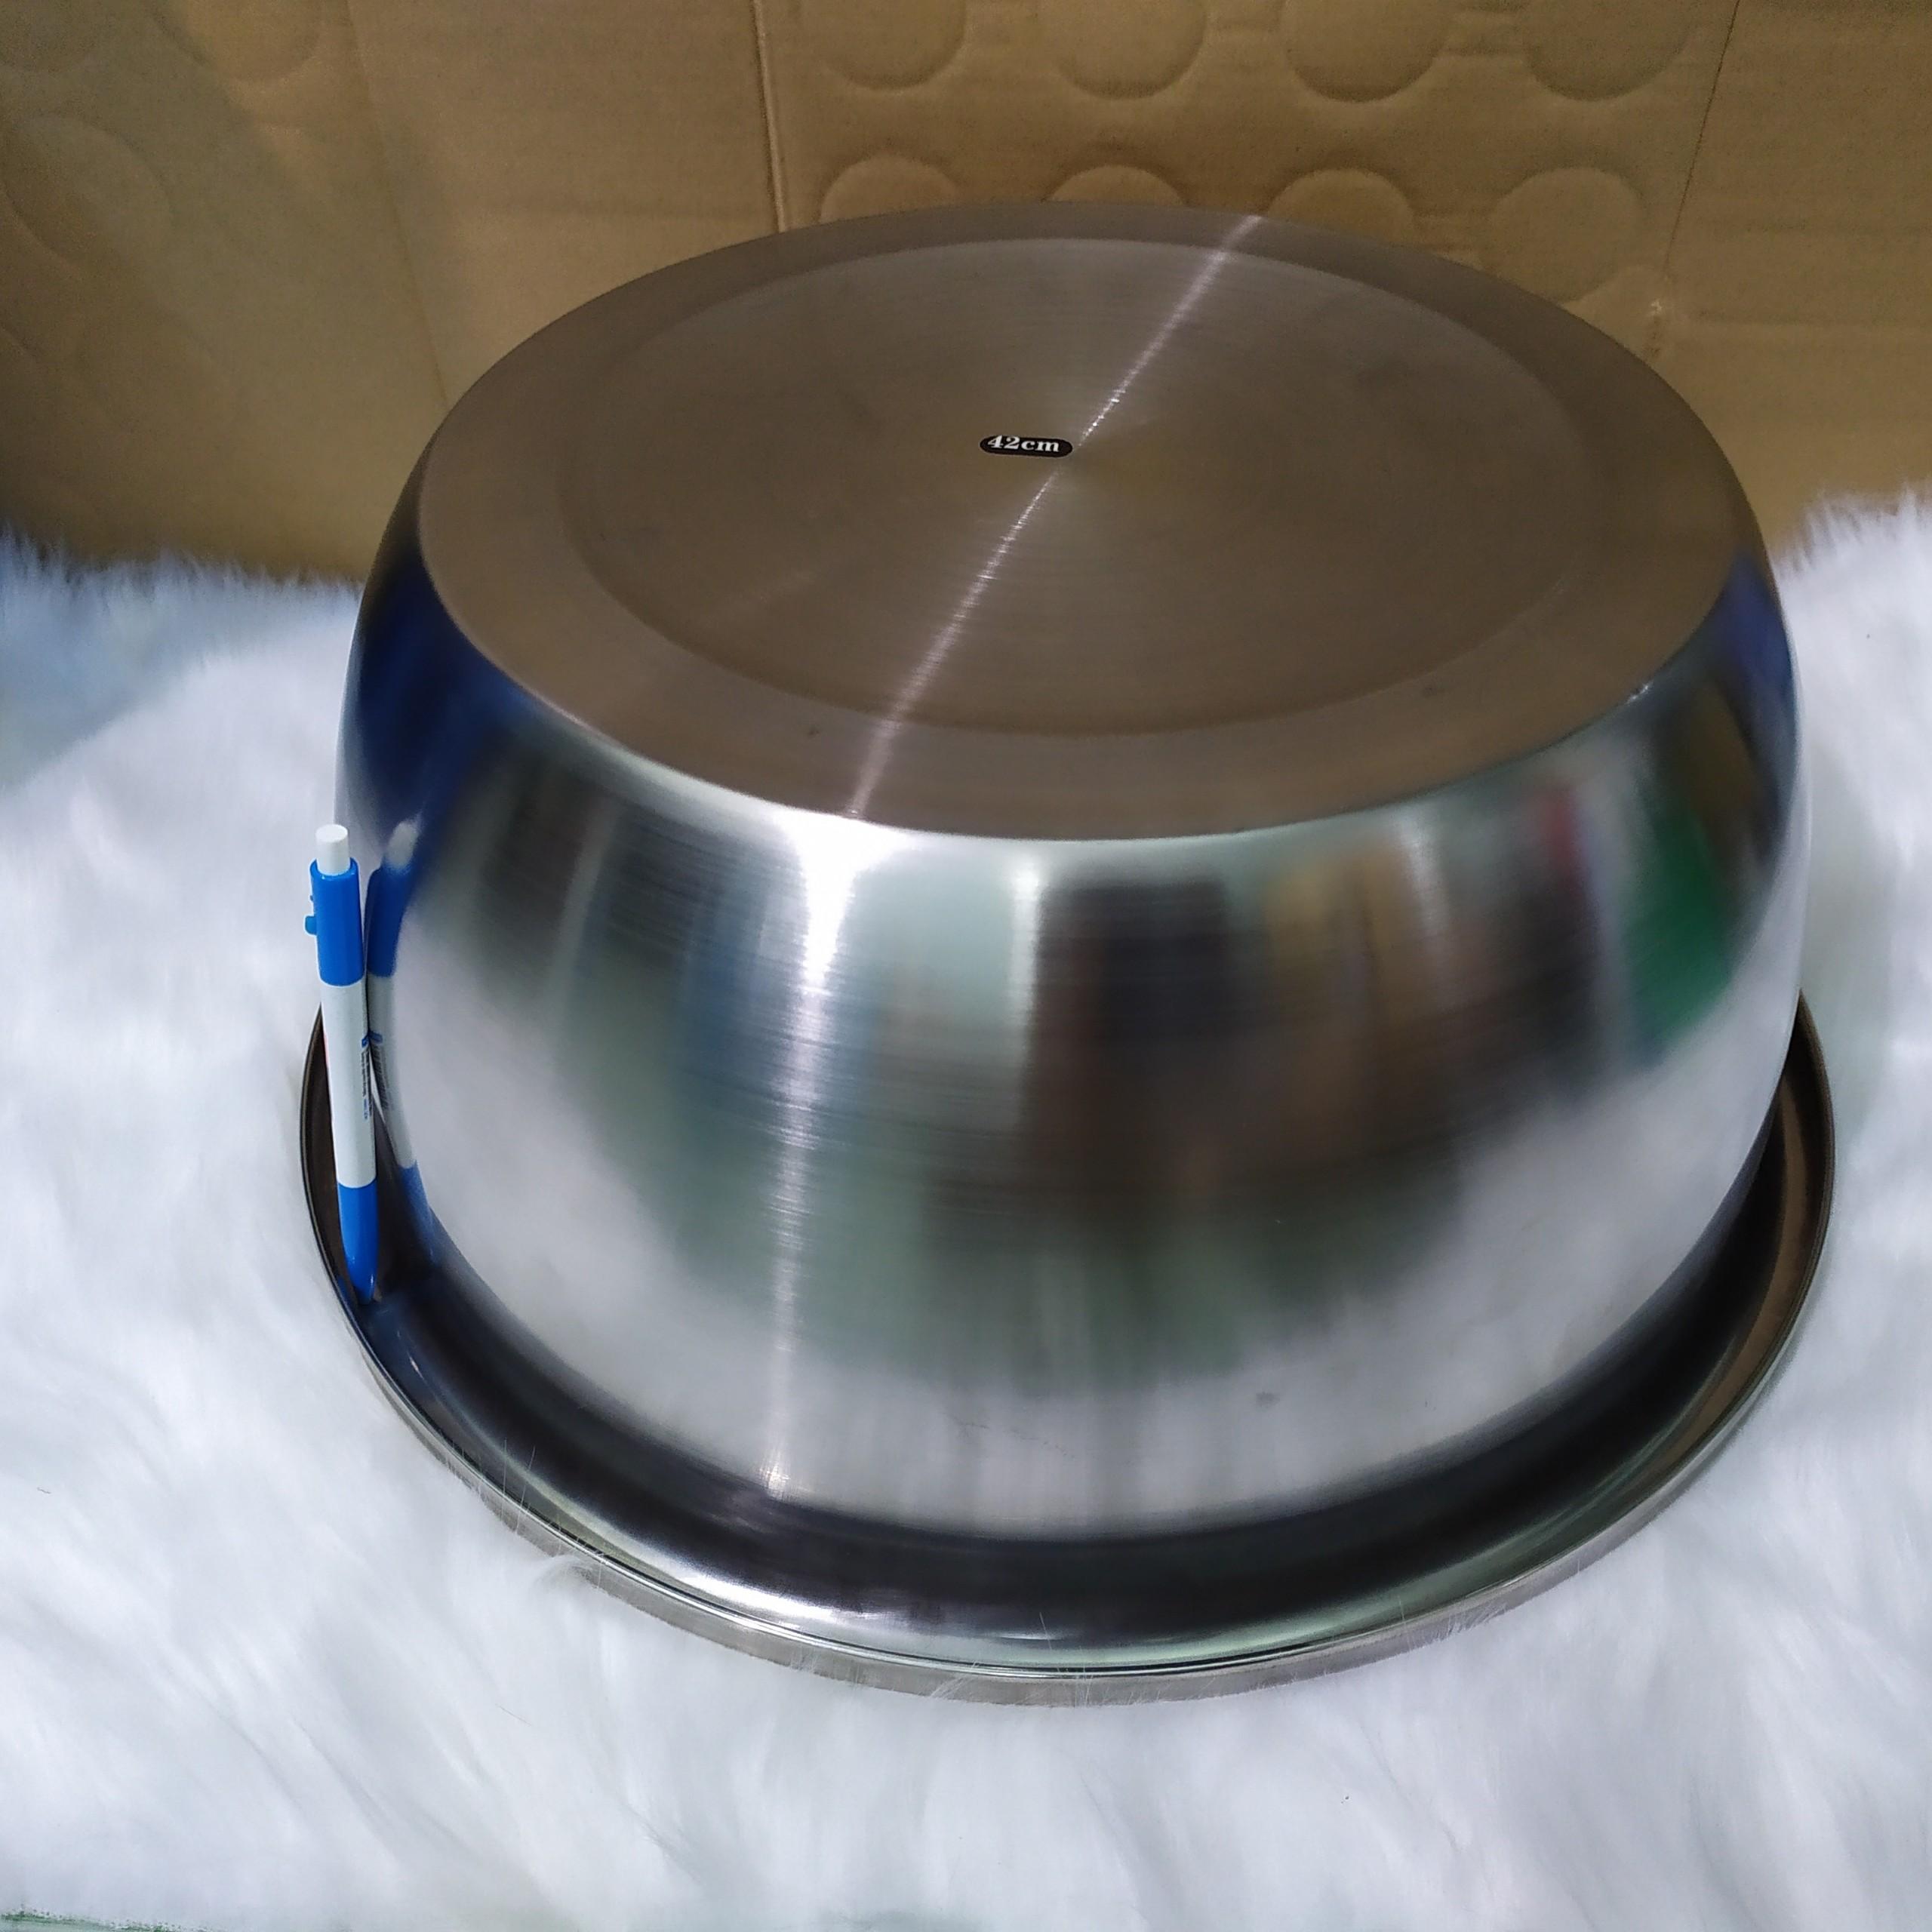 Thau Inox 304 - Size 42cm